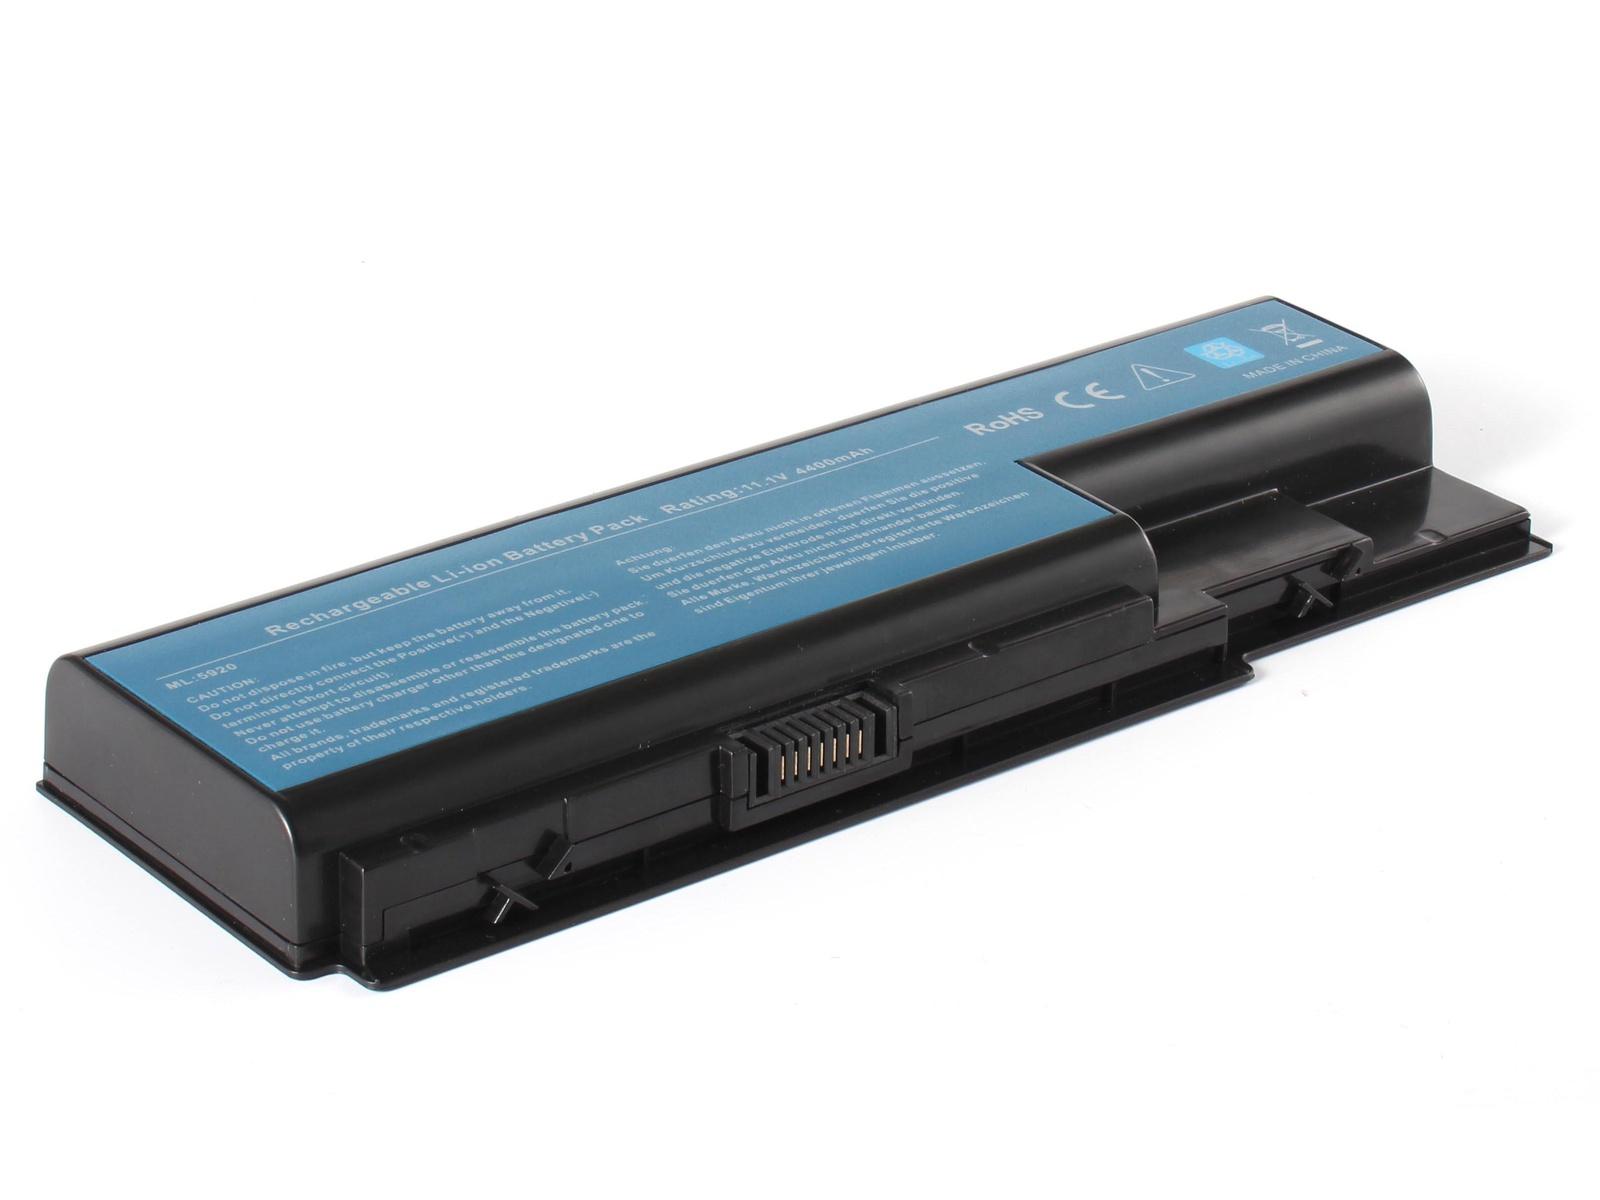 Аккумулятор для ноутбука AnyBatt Acer, eMachines, Packard Bell AS07B31, AS07B51, AS07B41, AS07B42, AS07B32, AS07B61, AS07B71, AS07B72, BT.00604.025, AS07B52, BT.00607.010, BT.00804.024